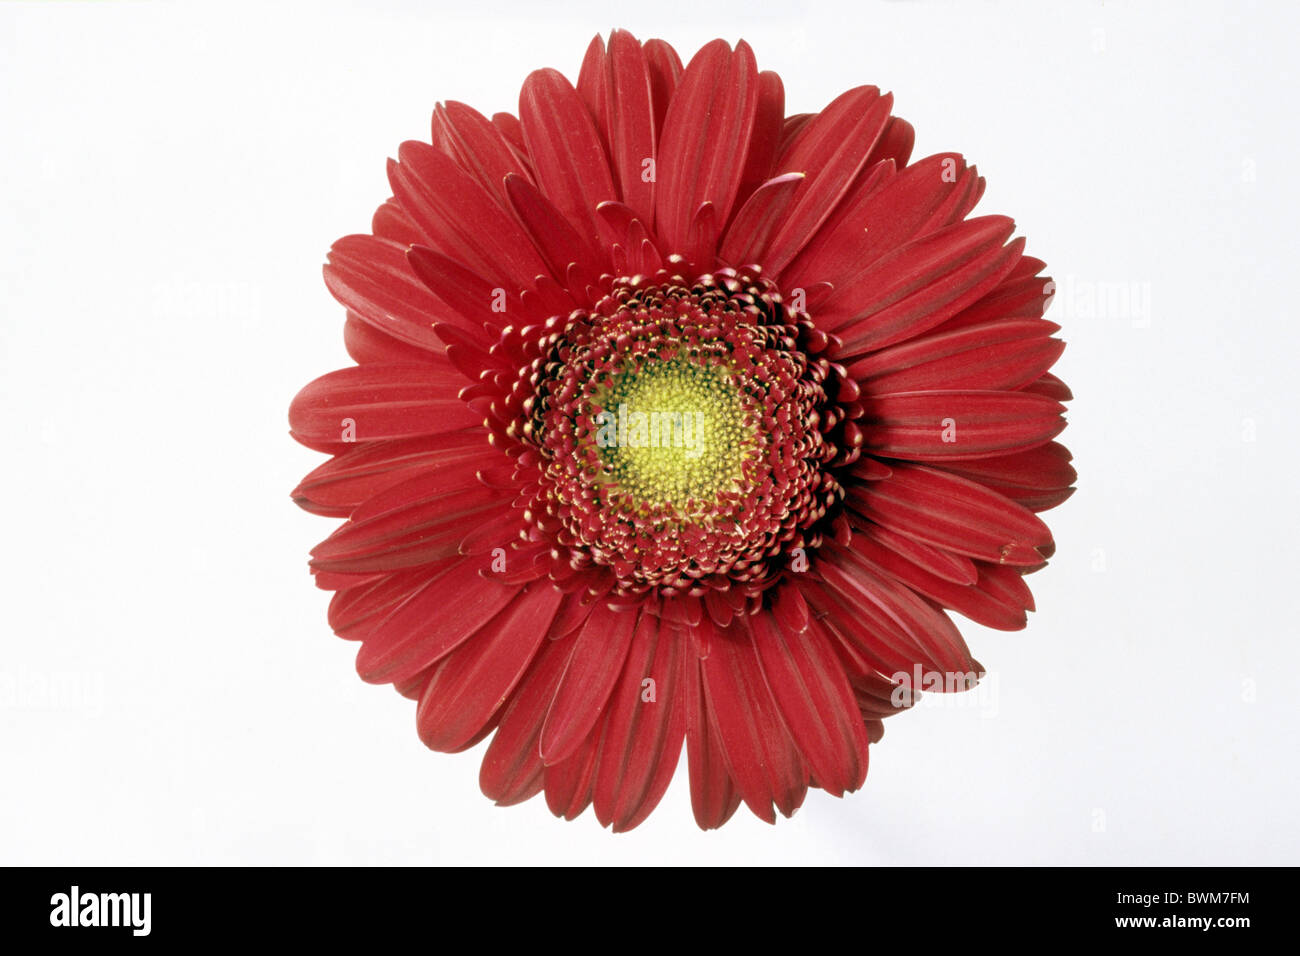 Gerbera (Gerbera hybrid), red flower, studio picture. - Stock Image